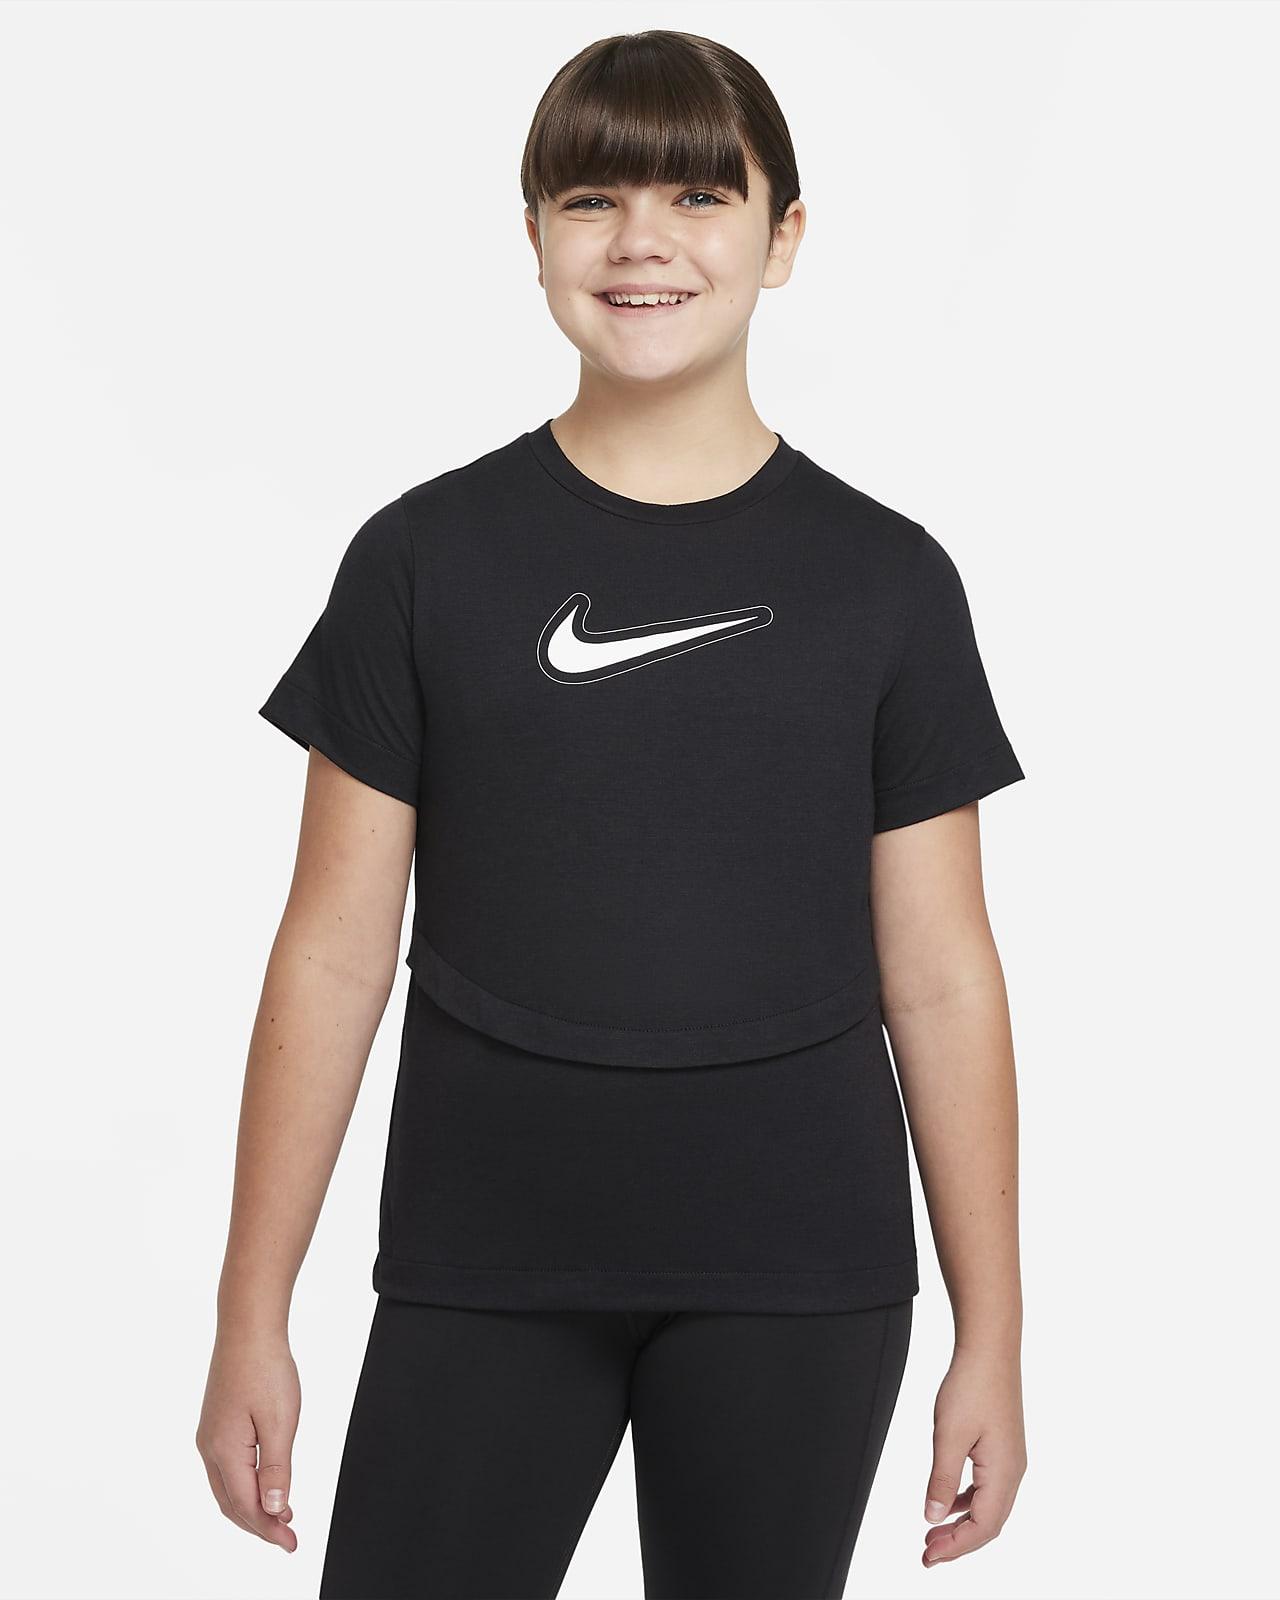 Nike Dri-FIT Trophy Older Kids' (Girls') Short-Sleeve Training Top (Extended Size)